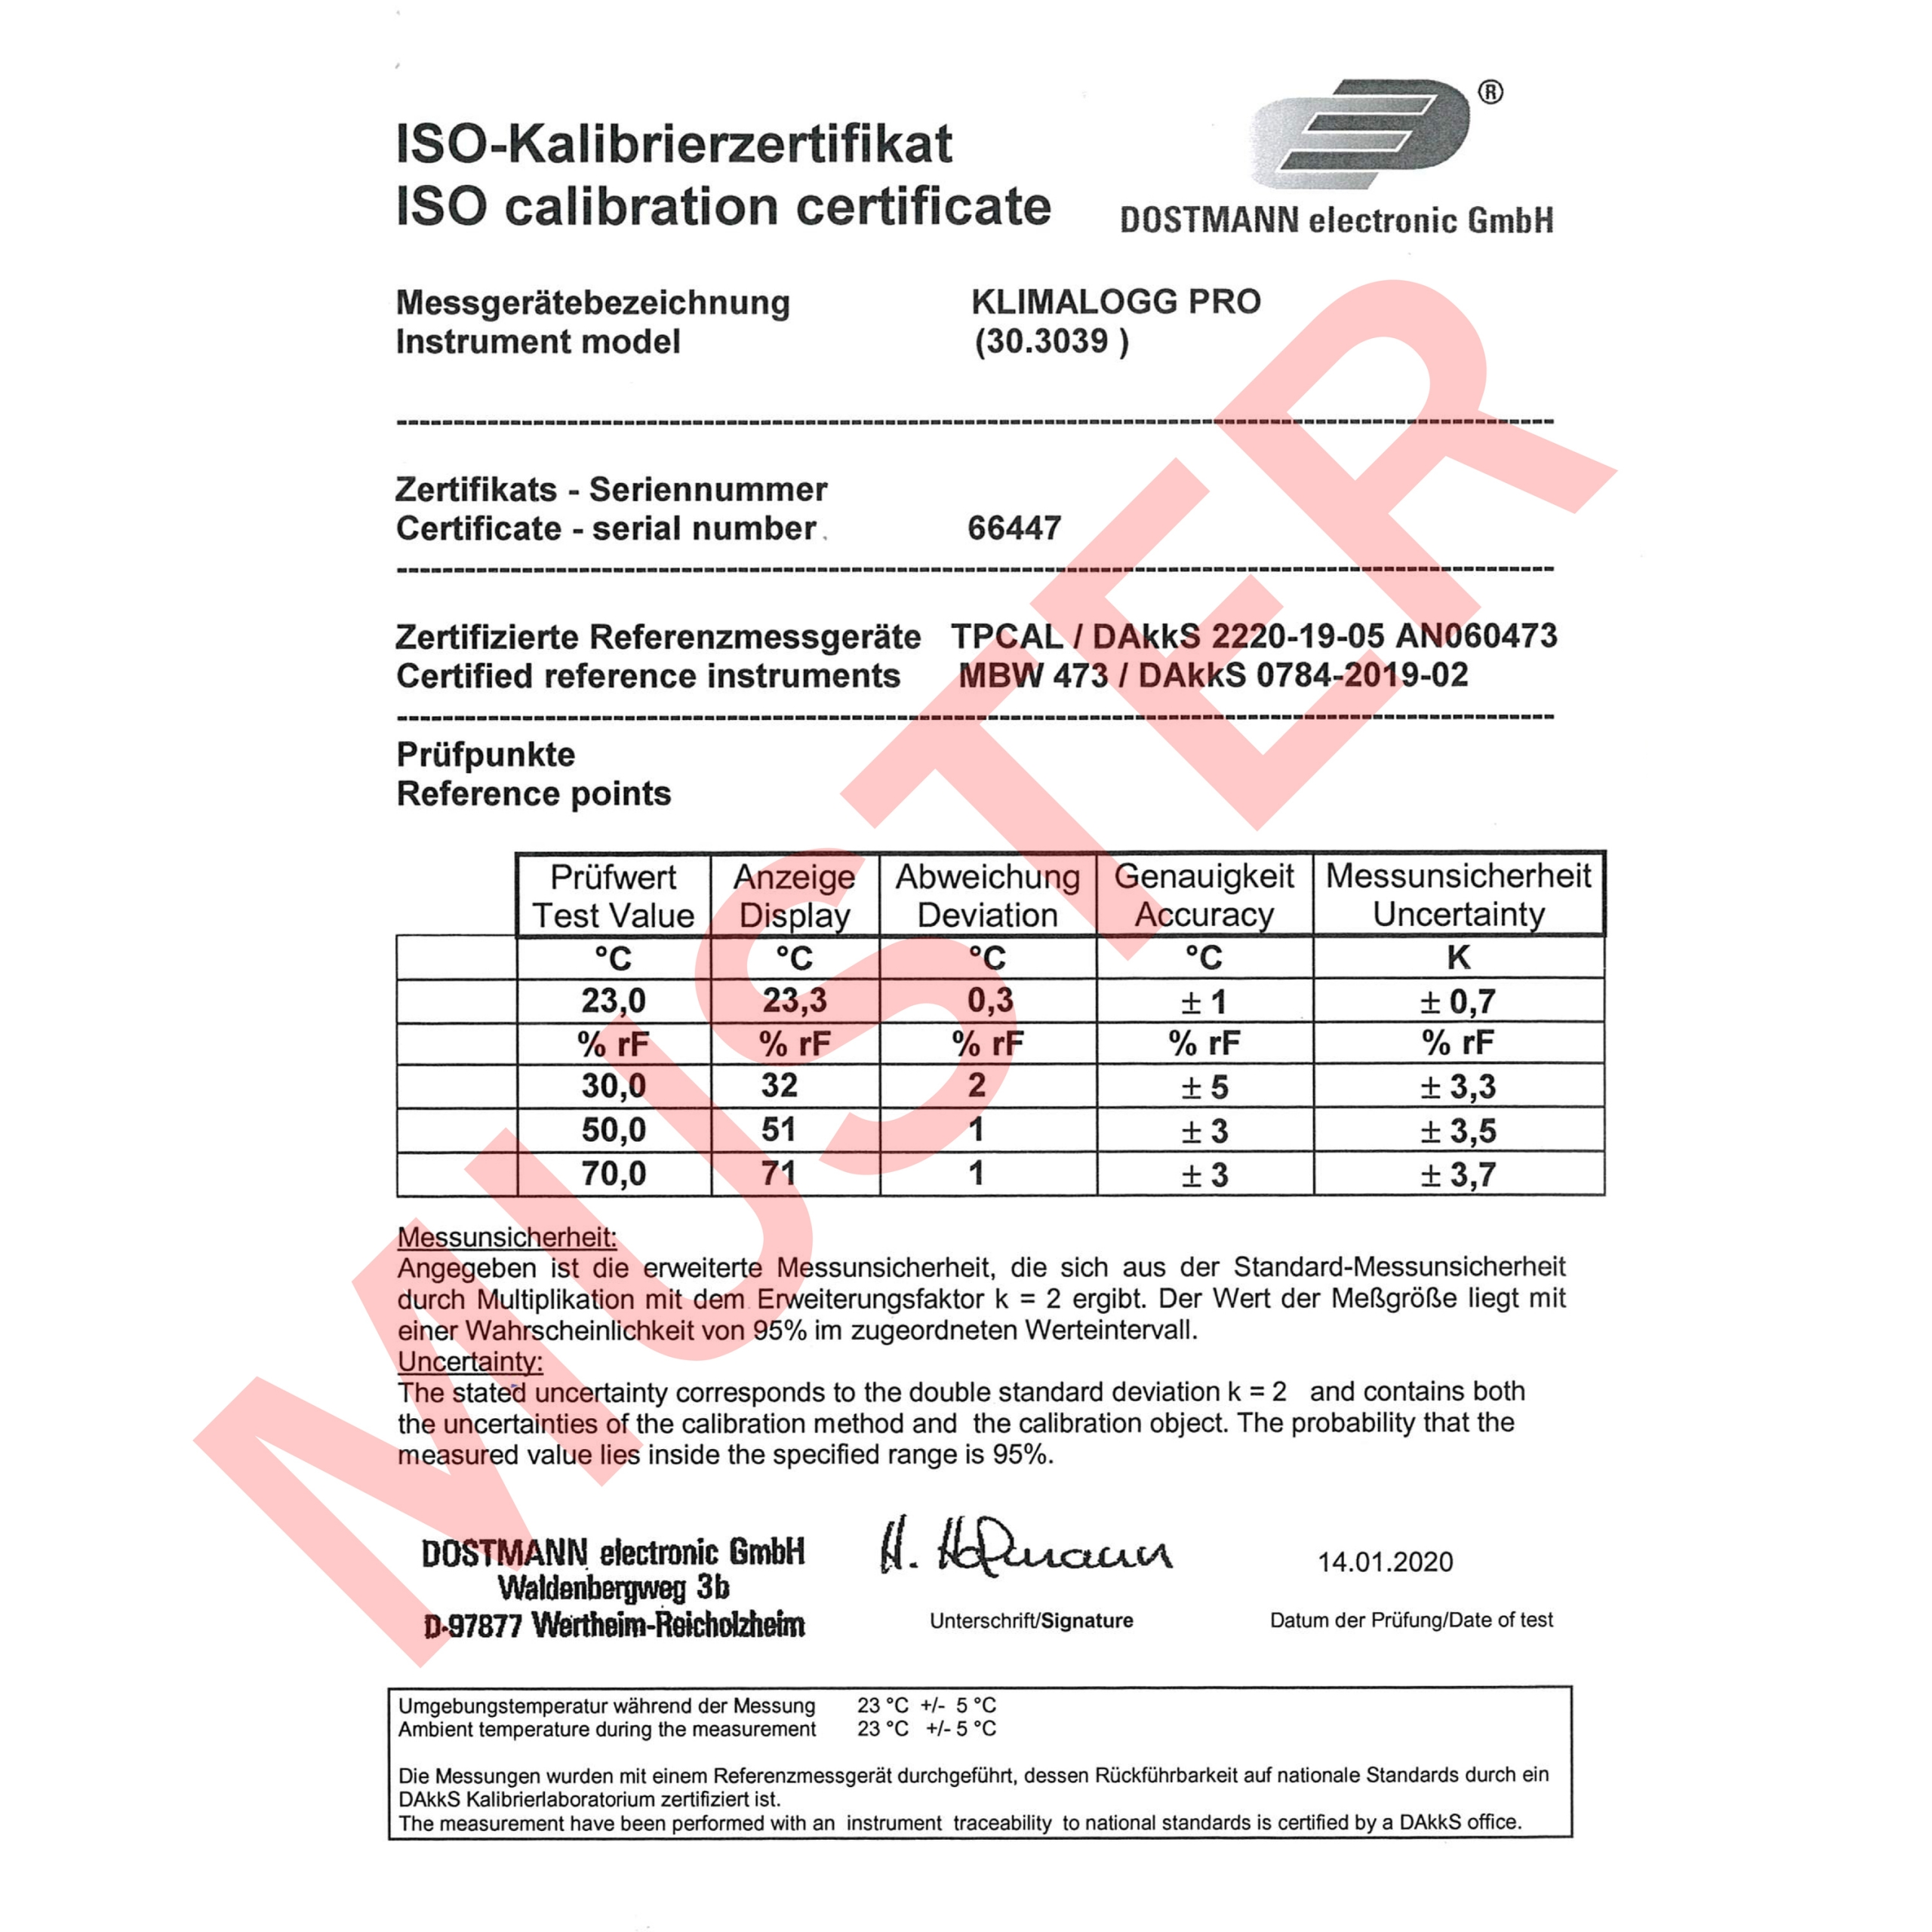 Zertifikat Muster Artikelnummer 303039.jpg